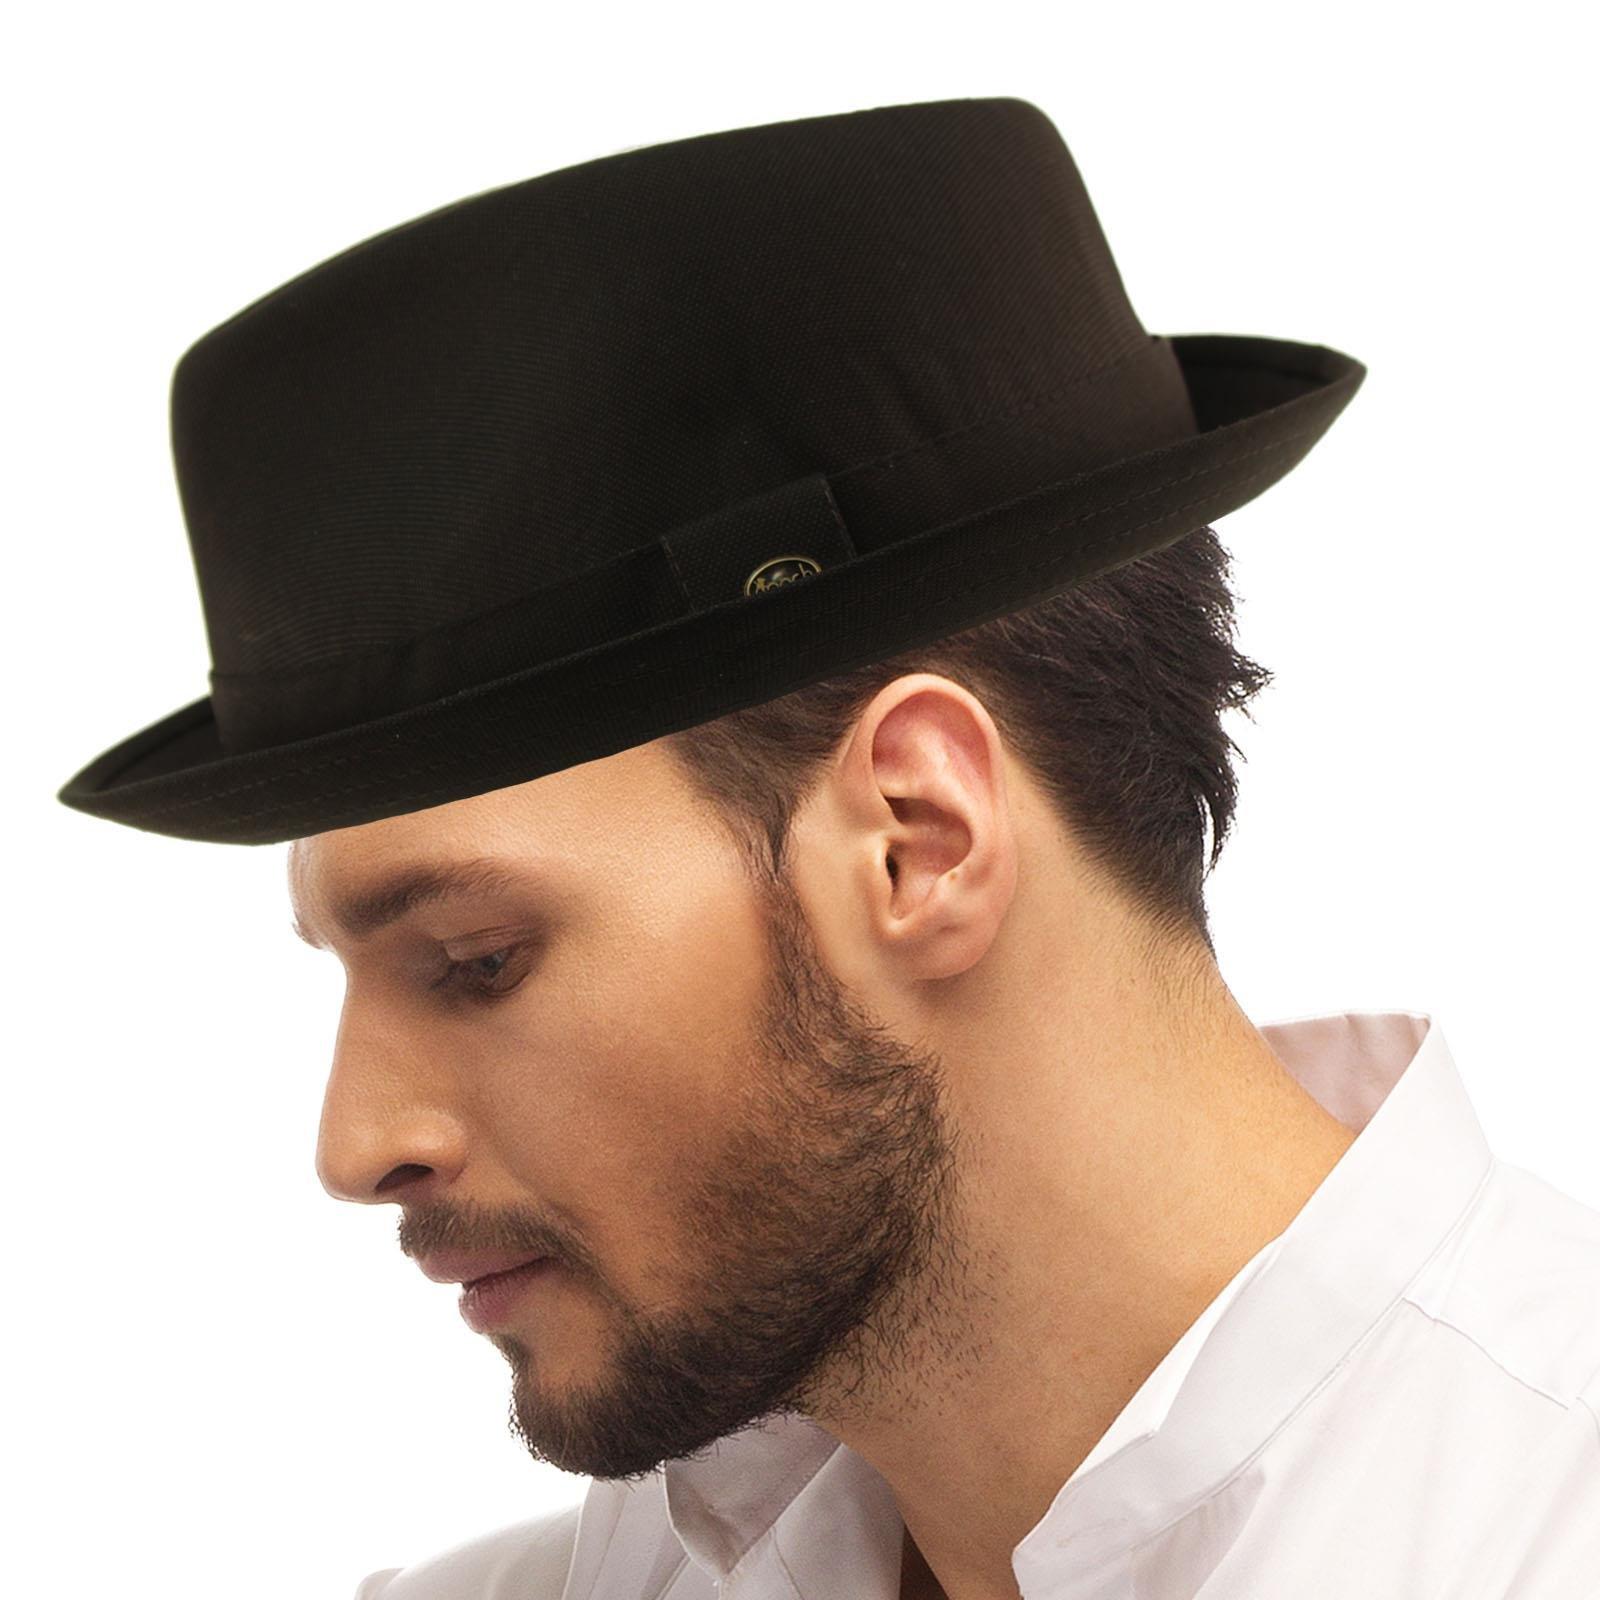 SK Hat shop Men's Fancy Suit Rayon Fabric Derby Fedora stingy Curled Brim Hat S/M